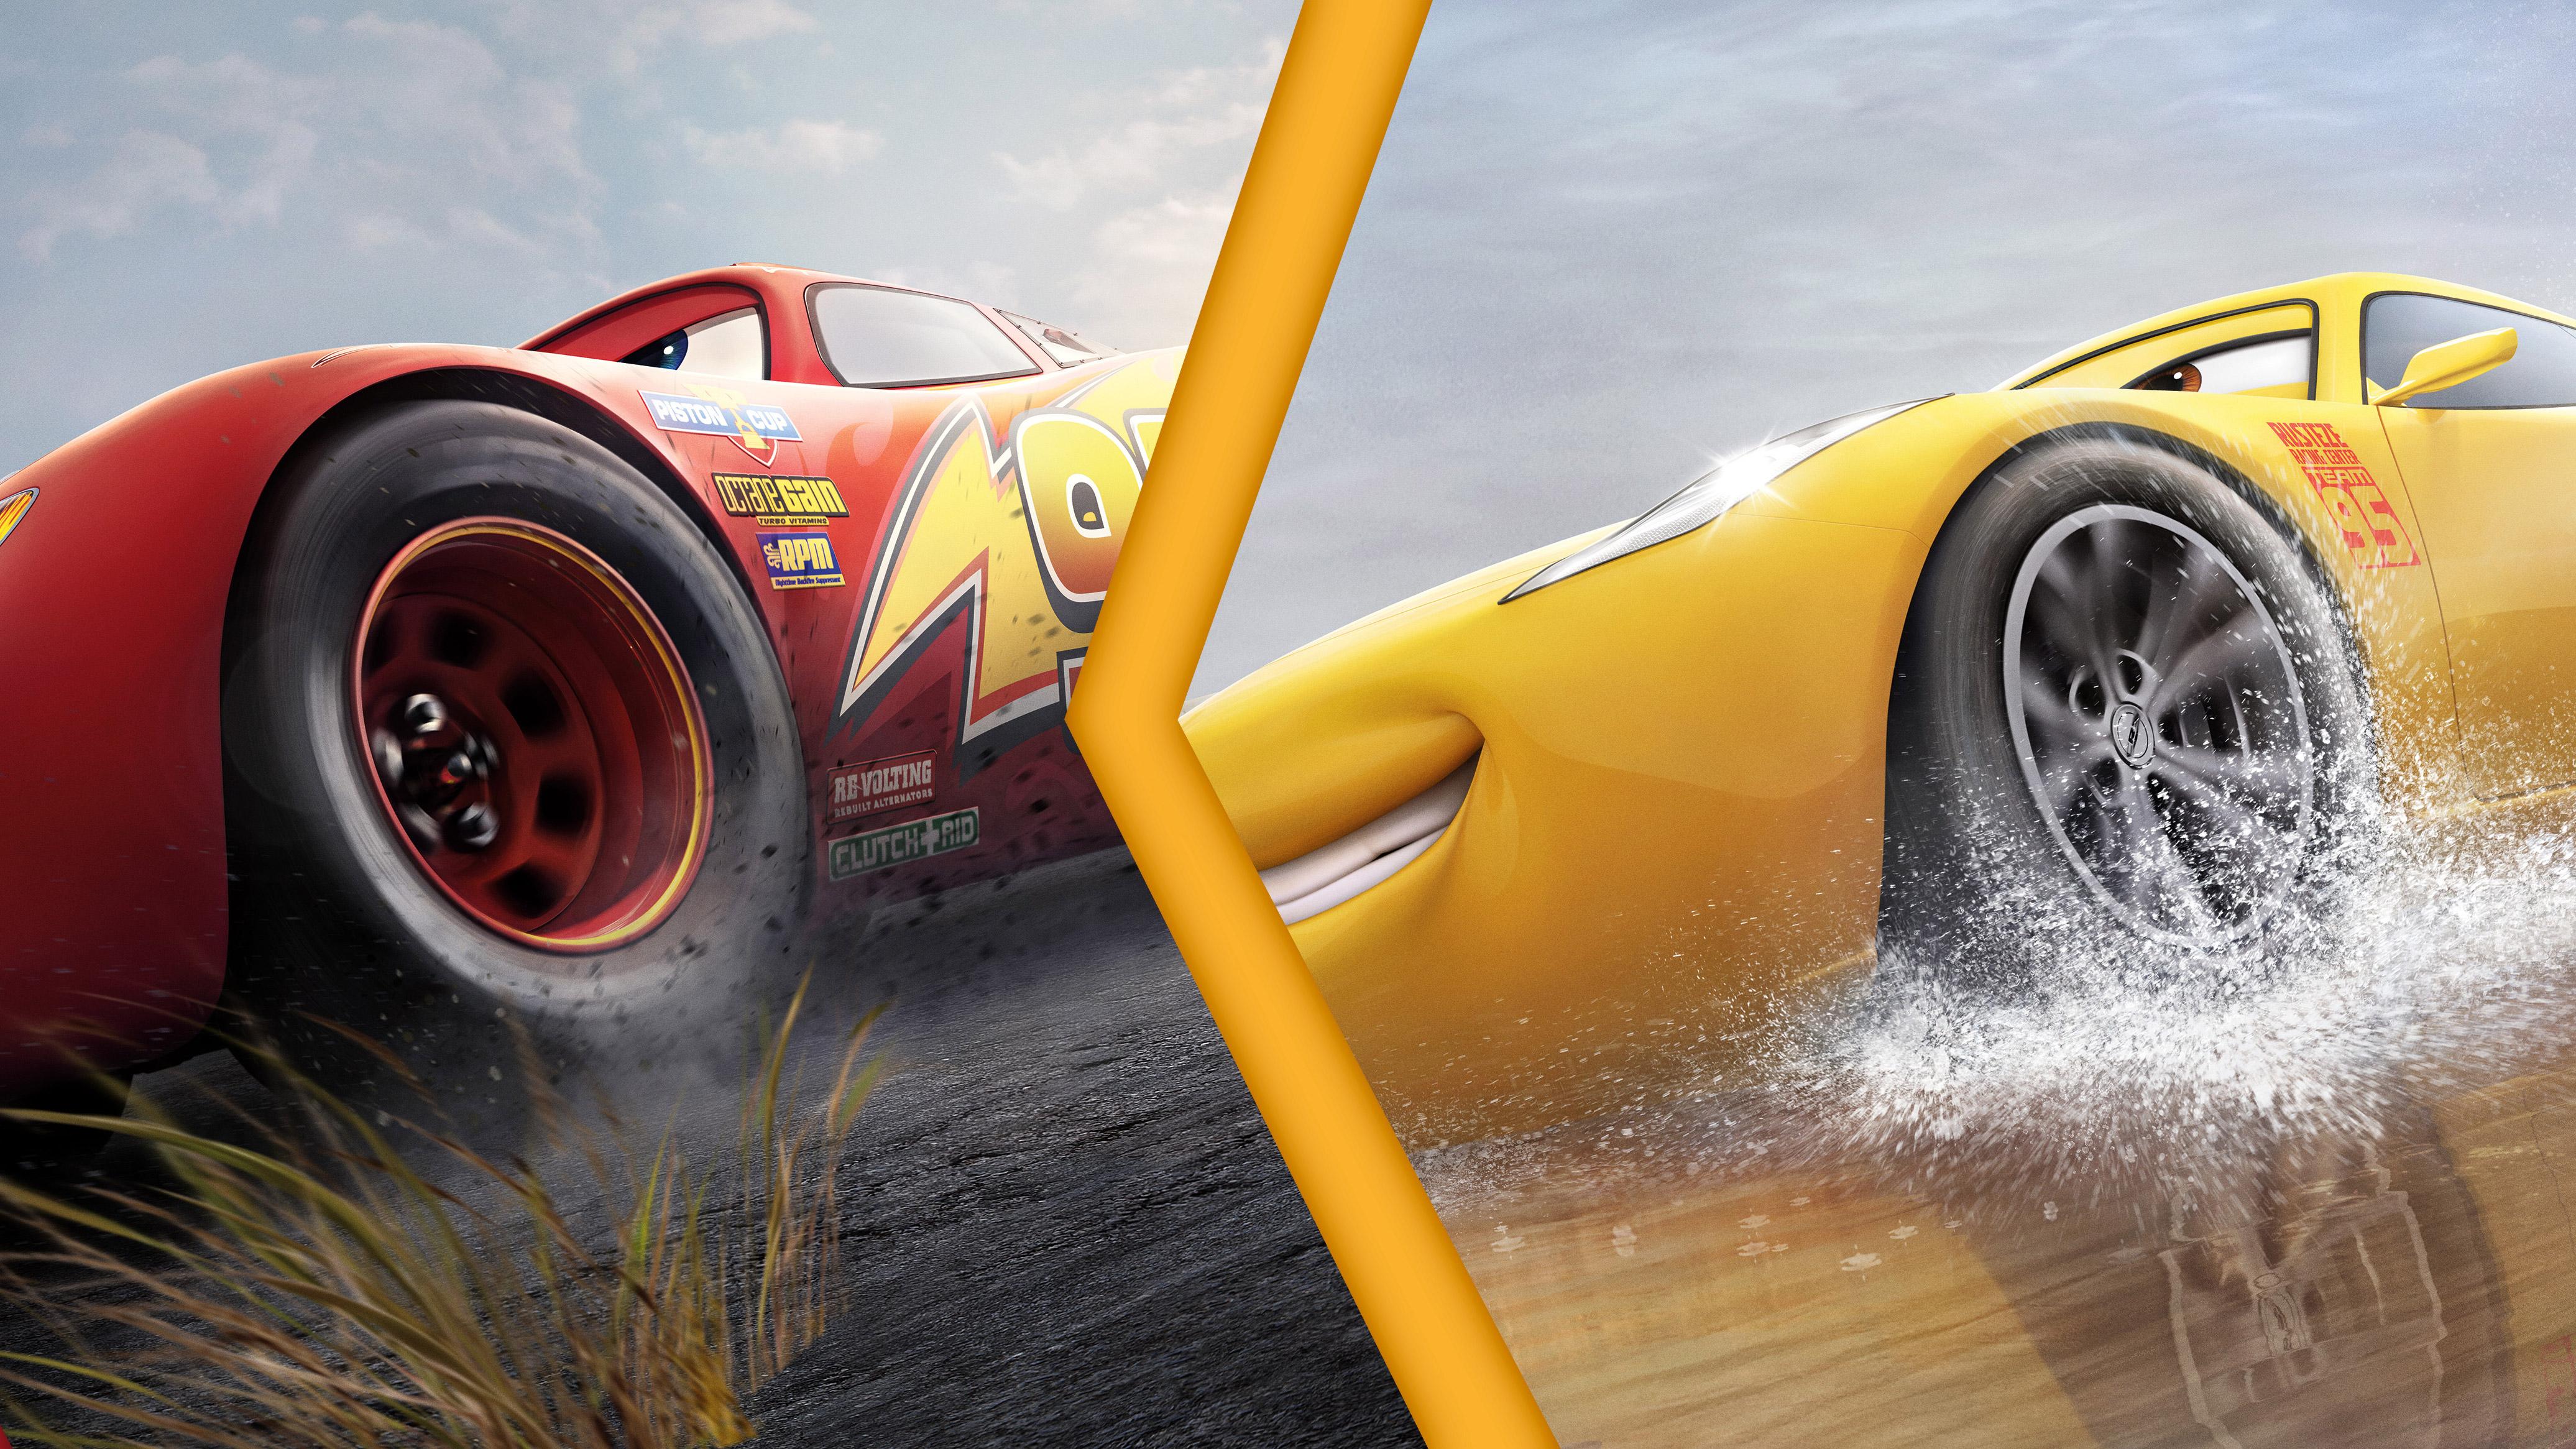 Lightning Mcqueen Vs Cruz Ramirez Cars 3 4k Hd Movies 4k